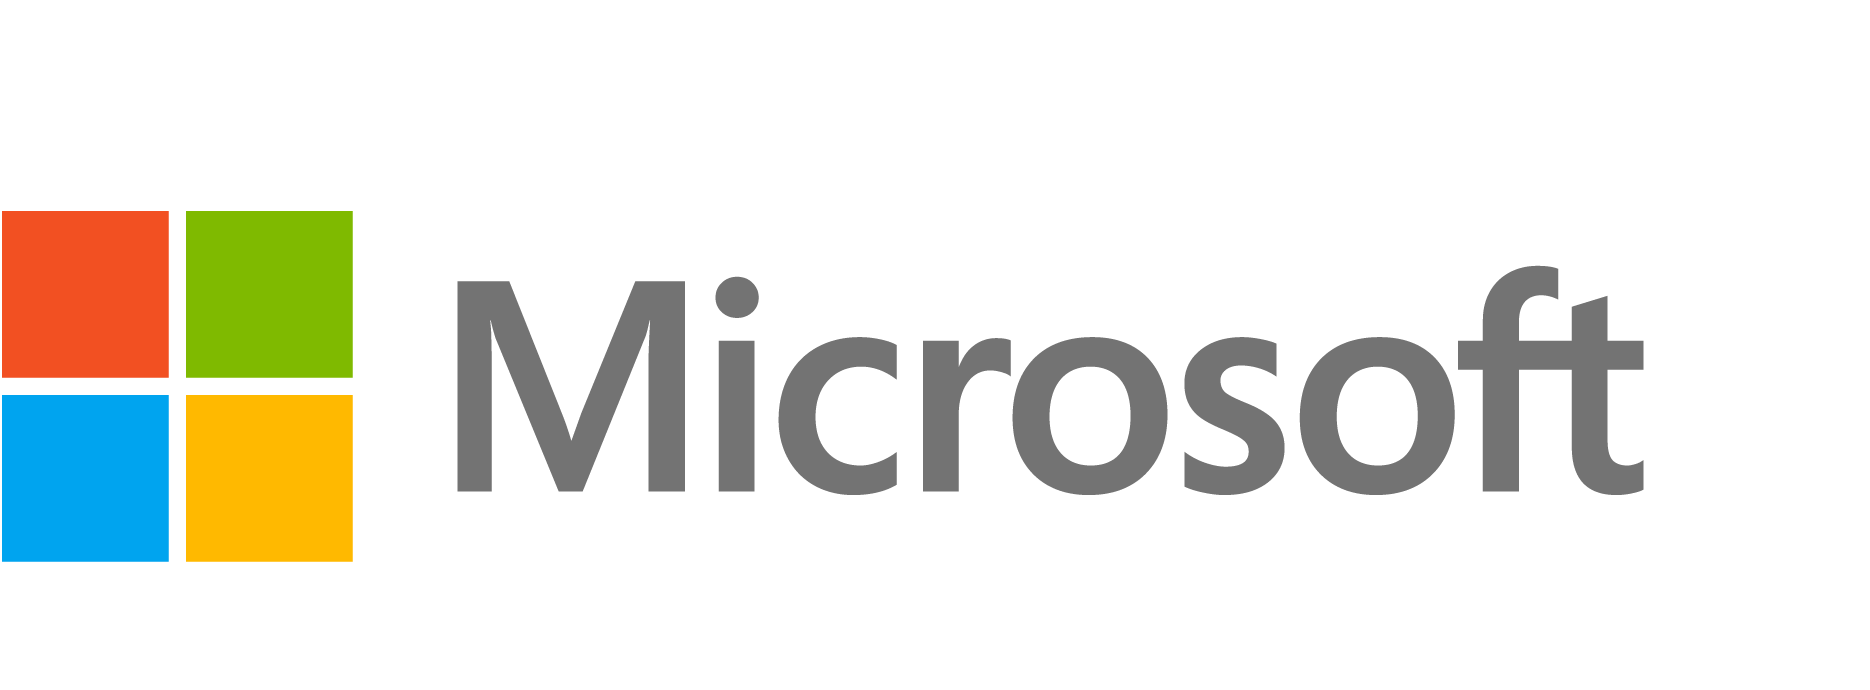 MSFT_logo_rgb_C-Gray.0ffb1153.png